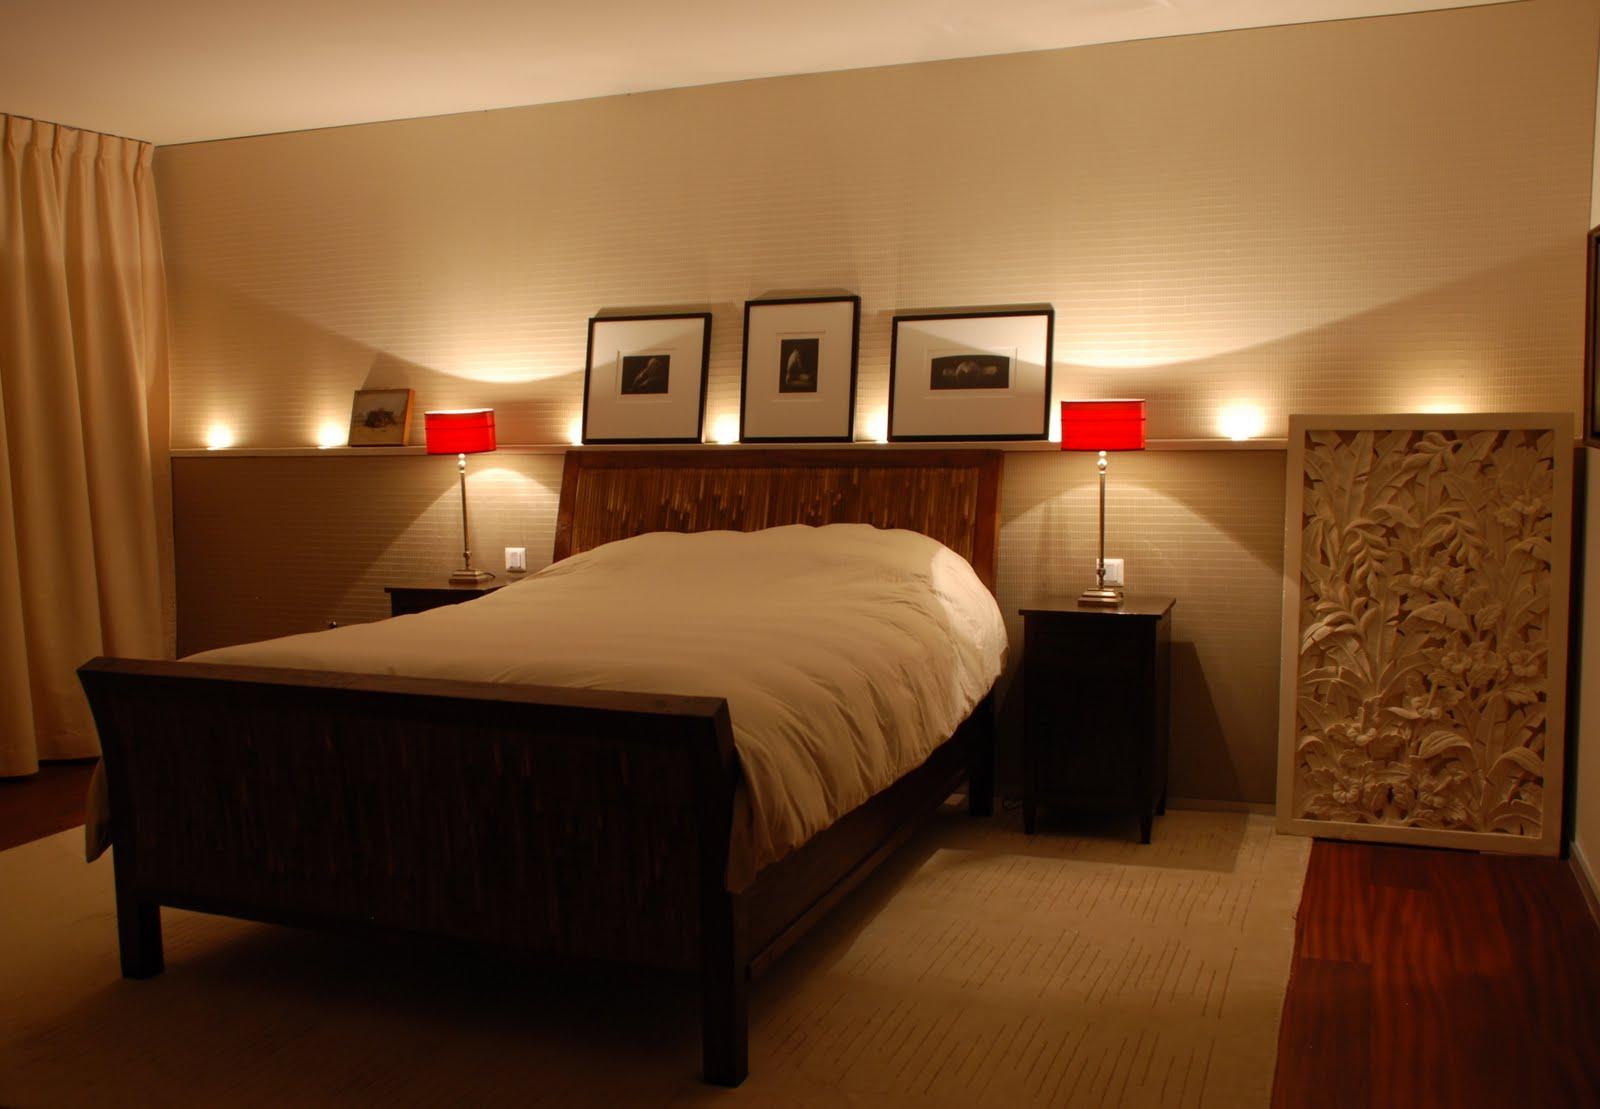 Luxury apartment in herrliberg master bedroom at night for Bedroom night